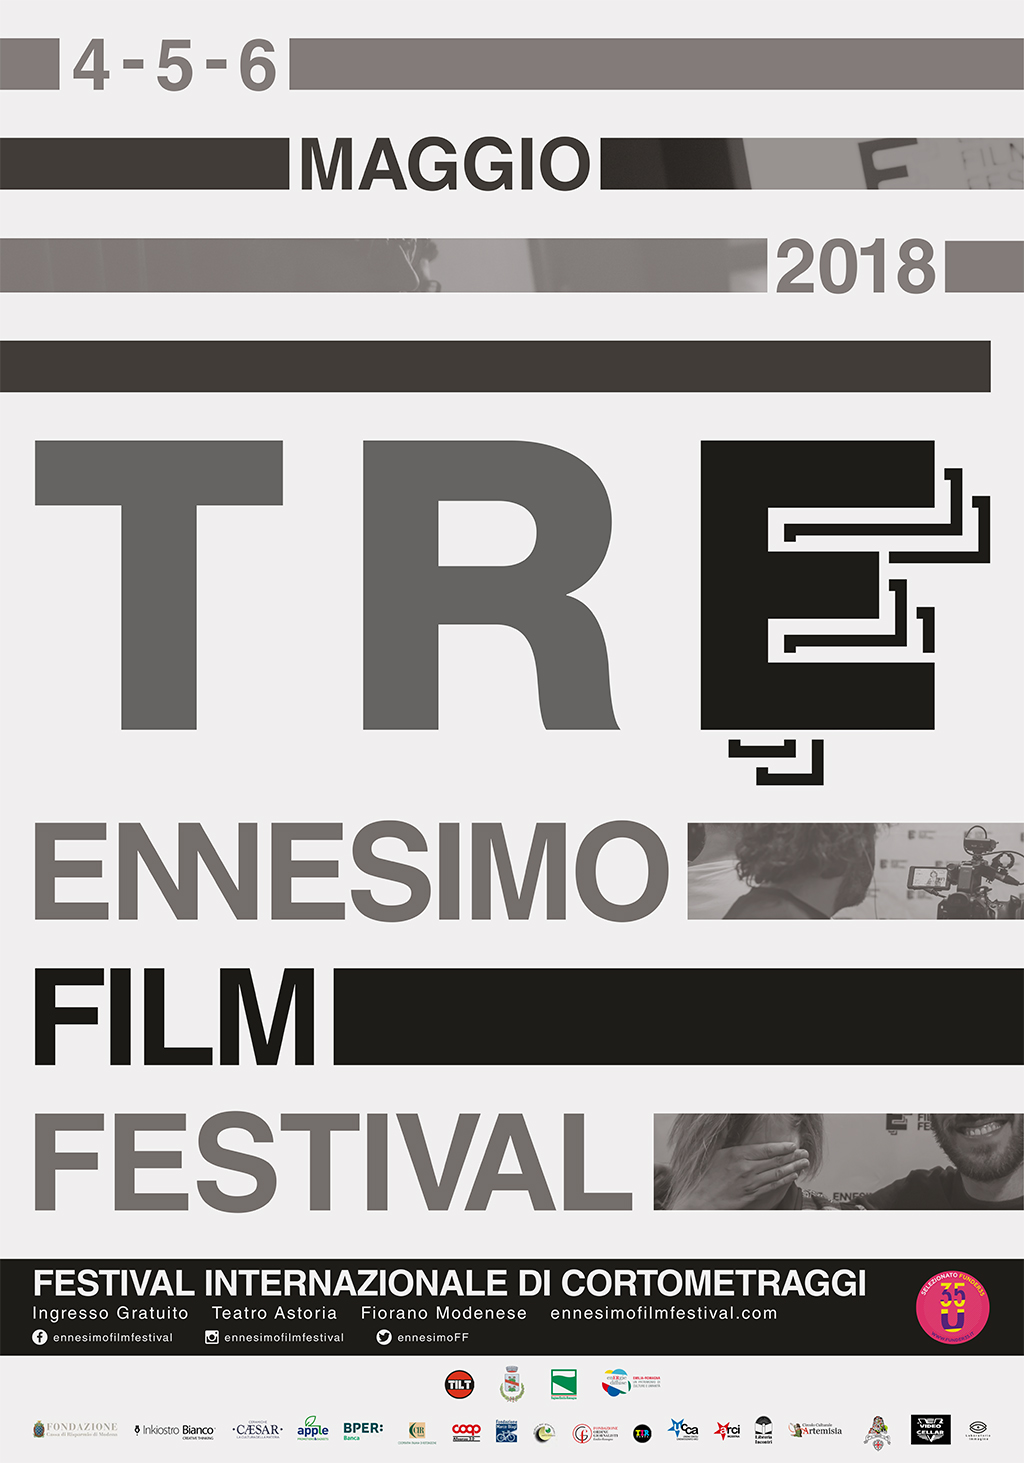 manifesto 2018 ennesimo film festival